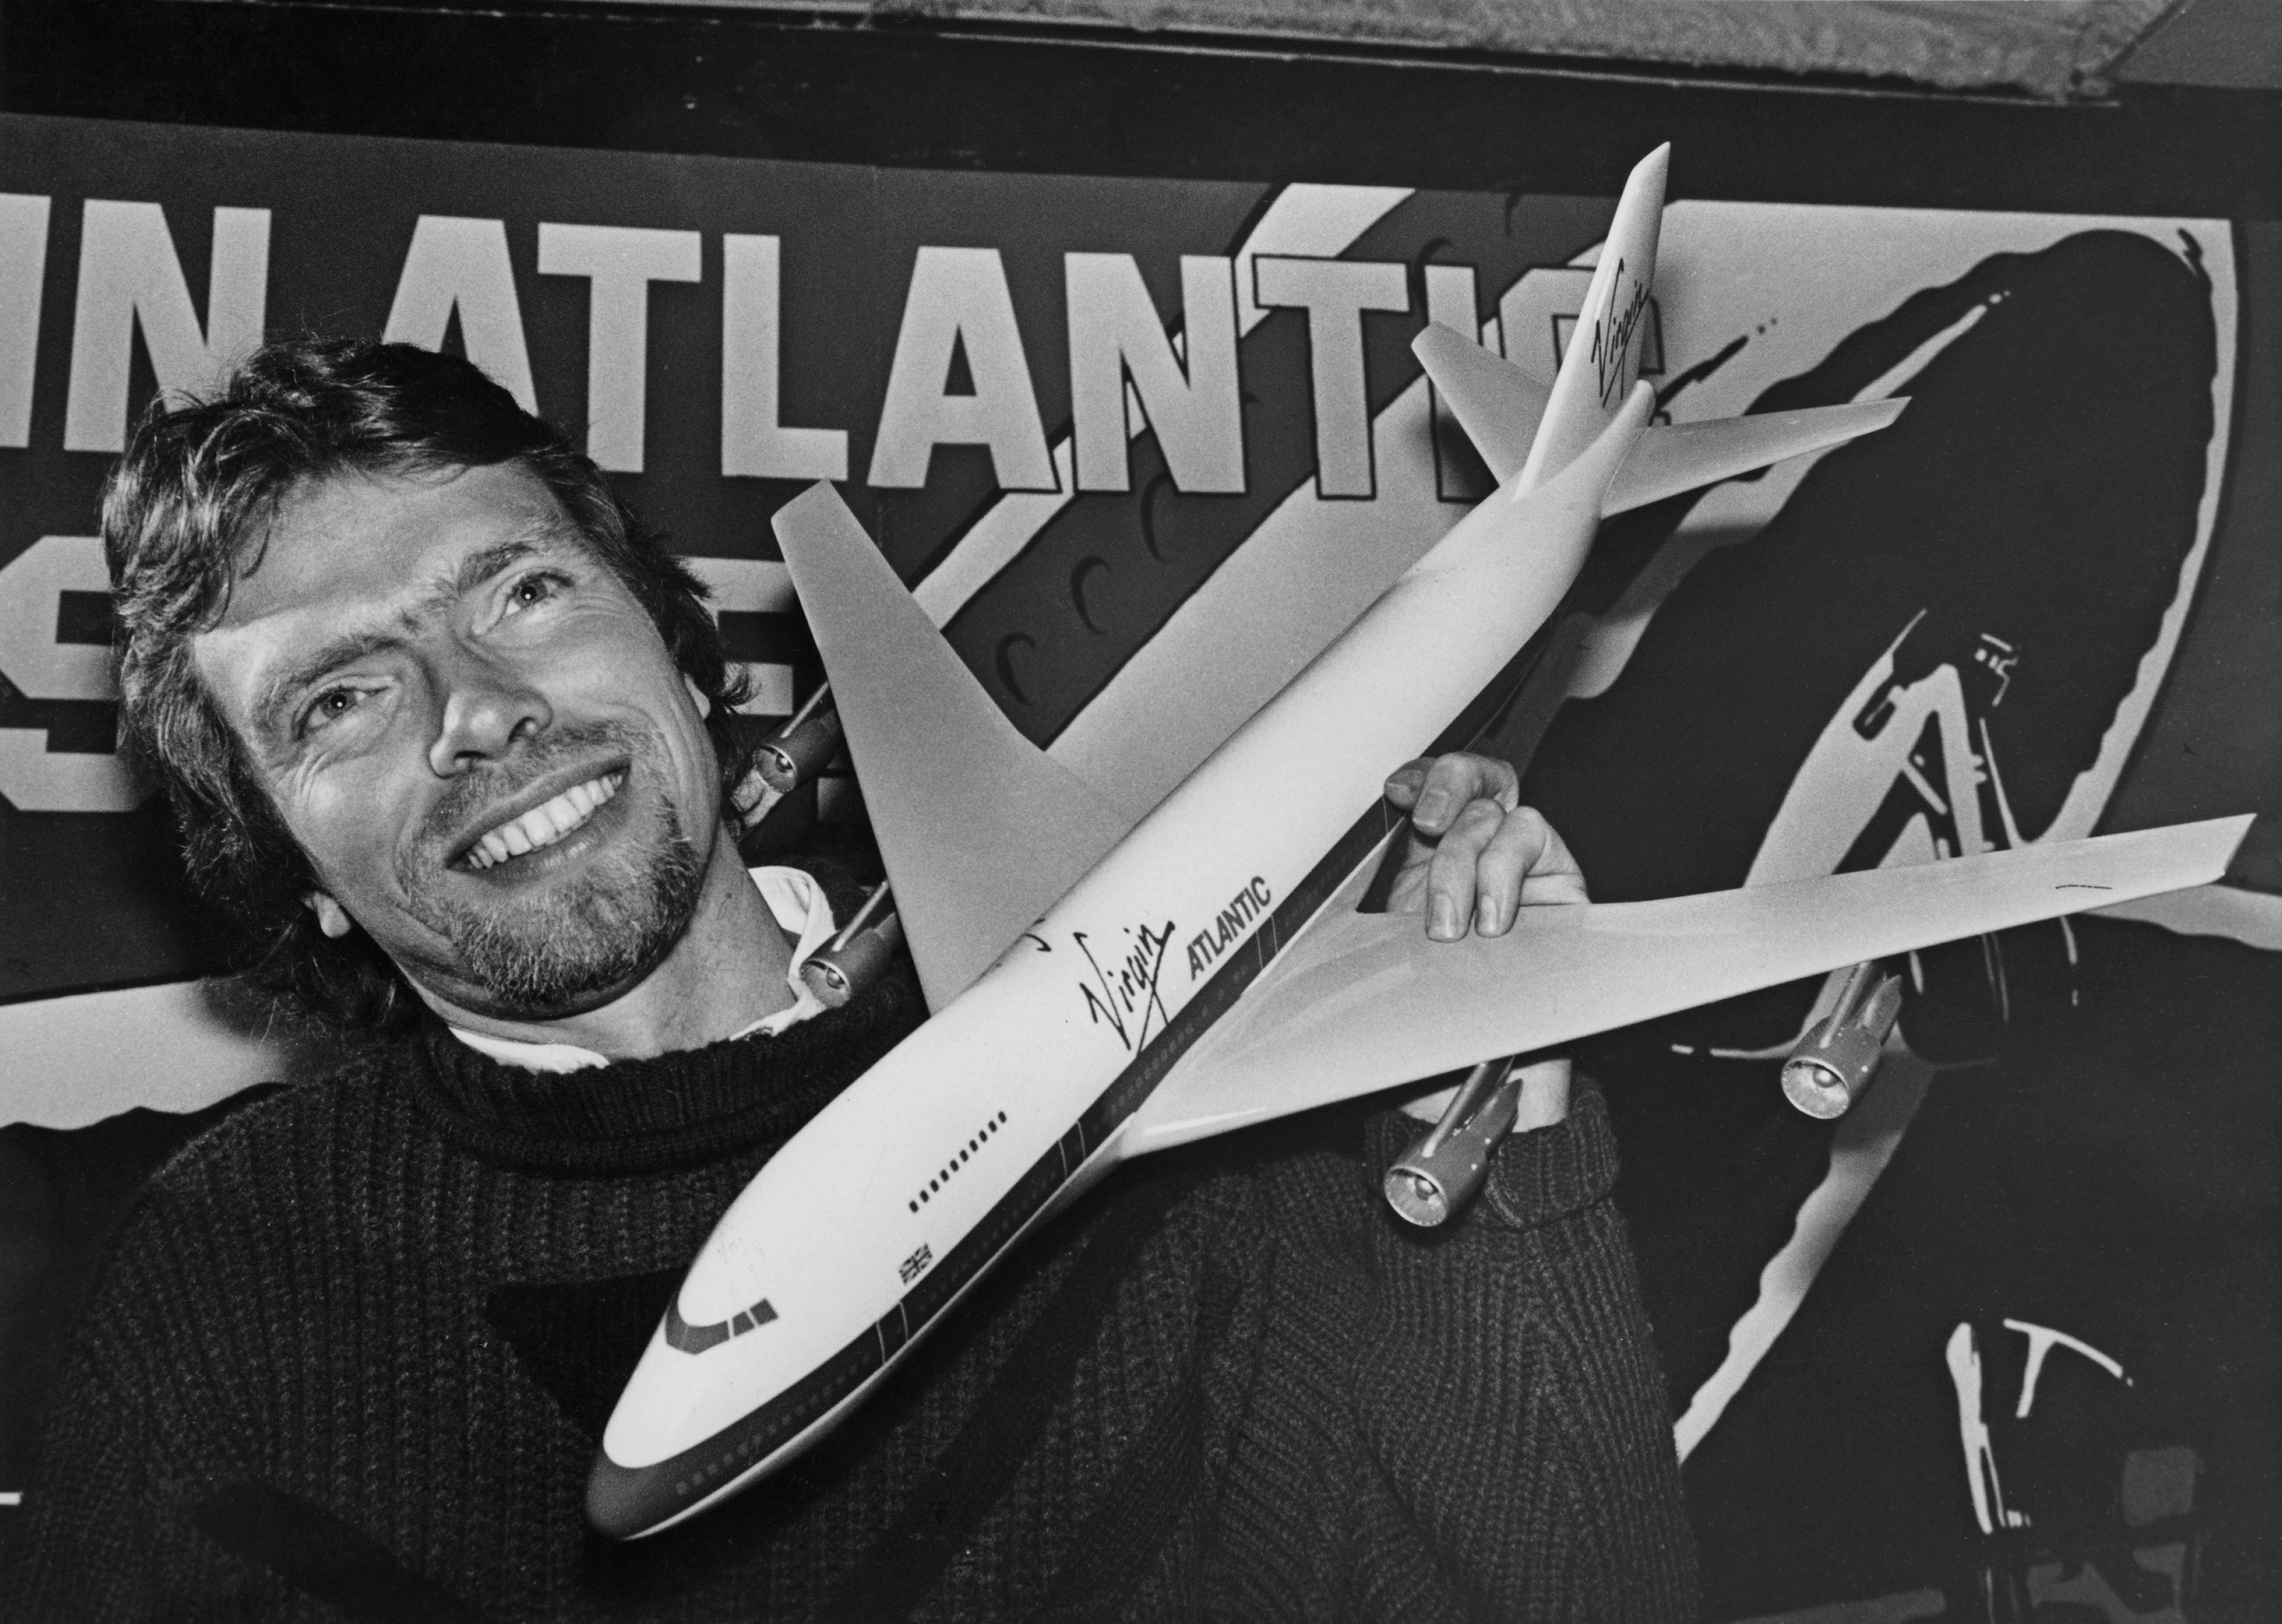 Branson Launches Virgin Atlantic